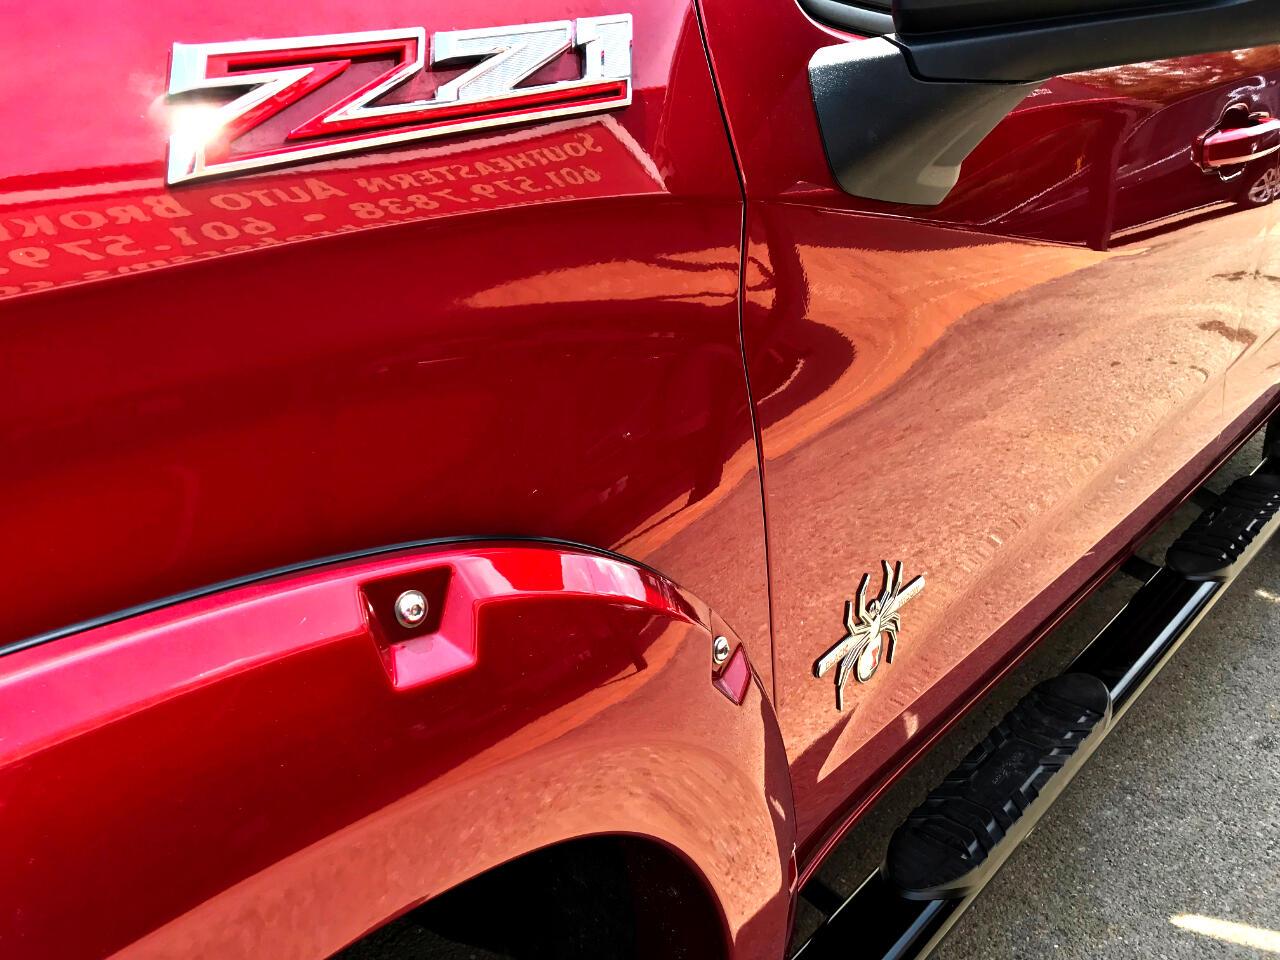 2019 Chevrolet Silverado 1500 RST CREW CAB 4WD SCA PERFORMANCE BLACK WIDOW CUSTO